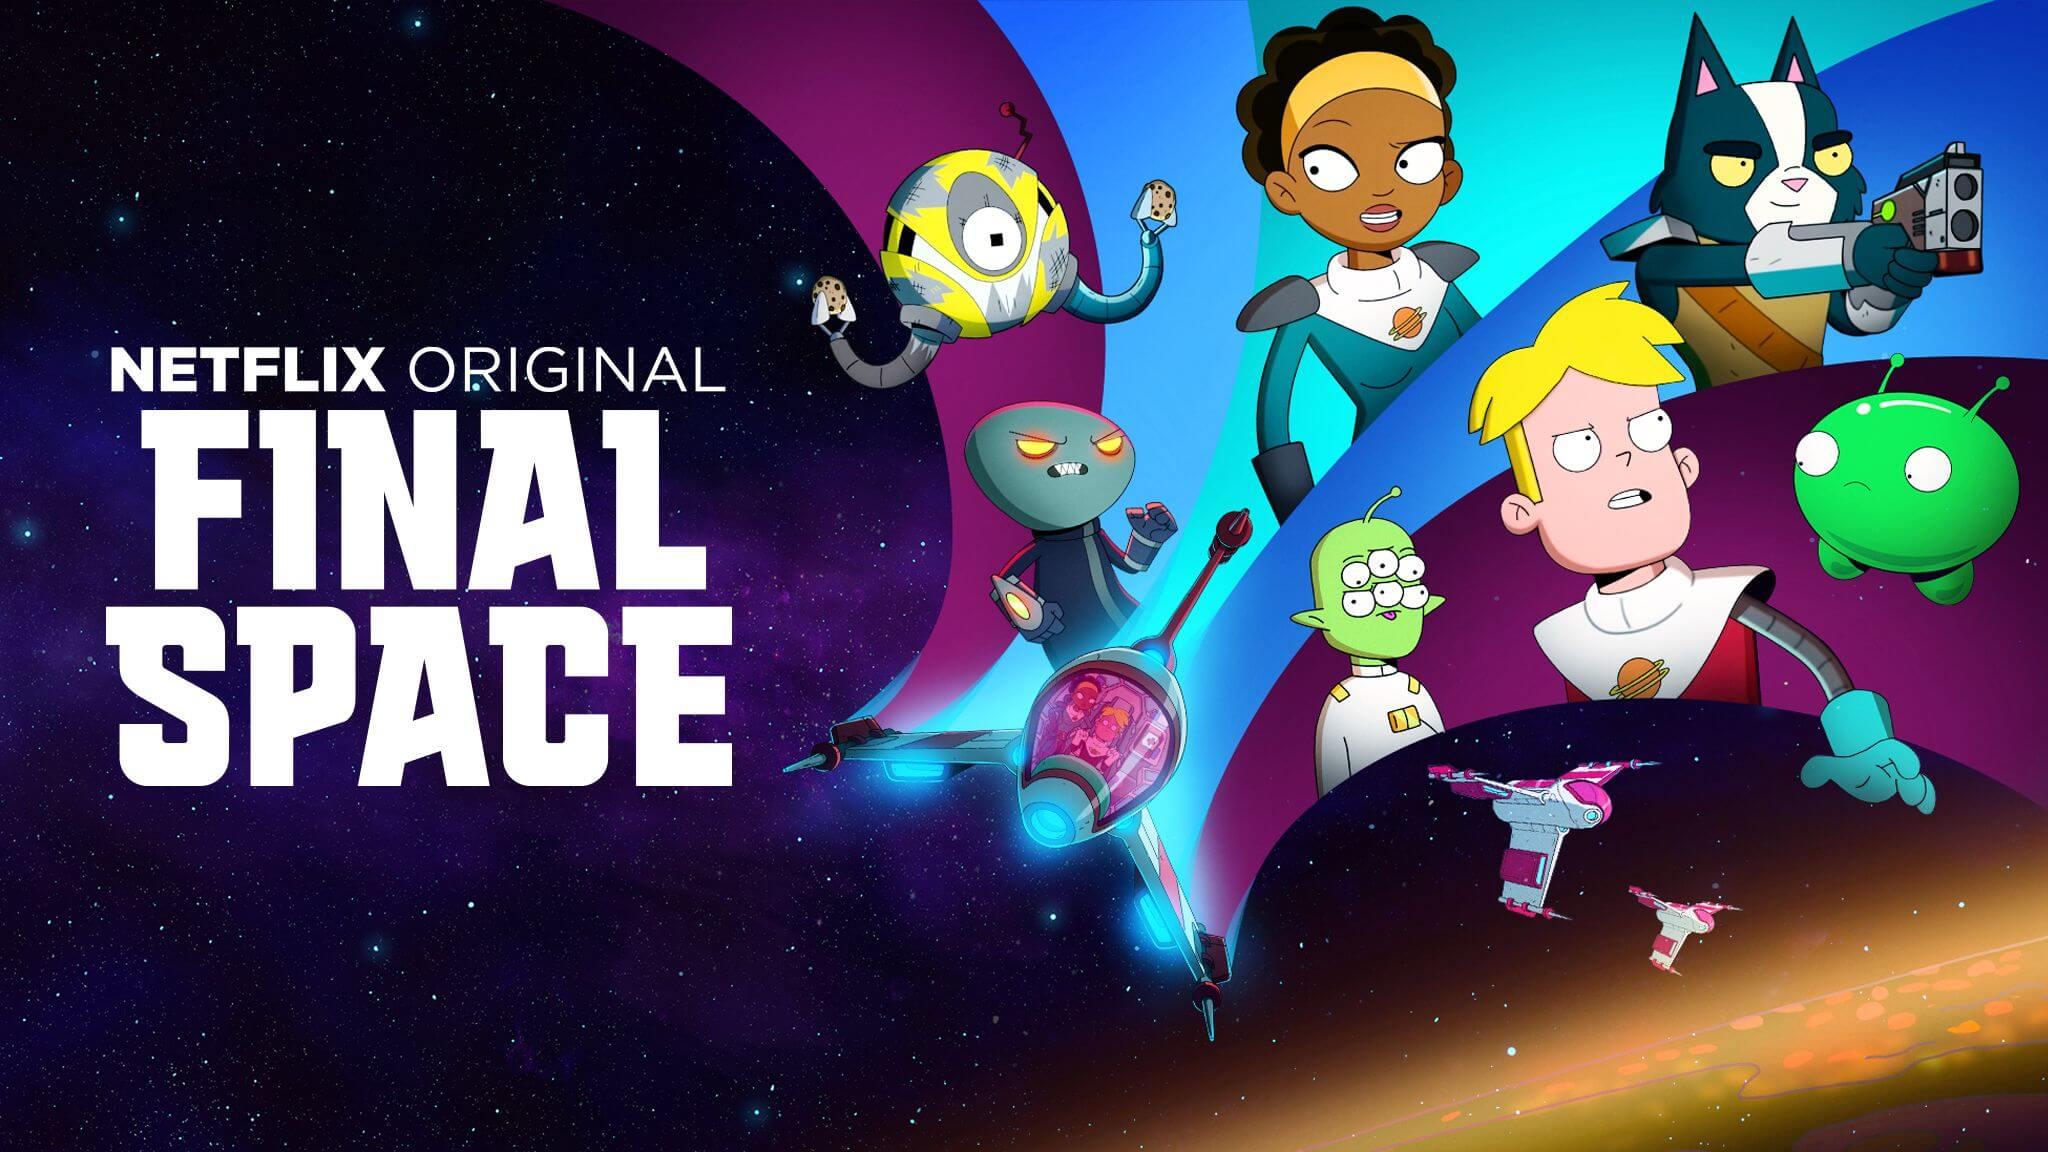 Final Space Netflix Season 3